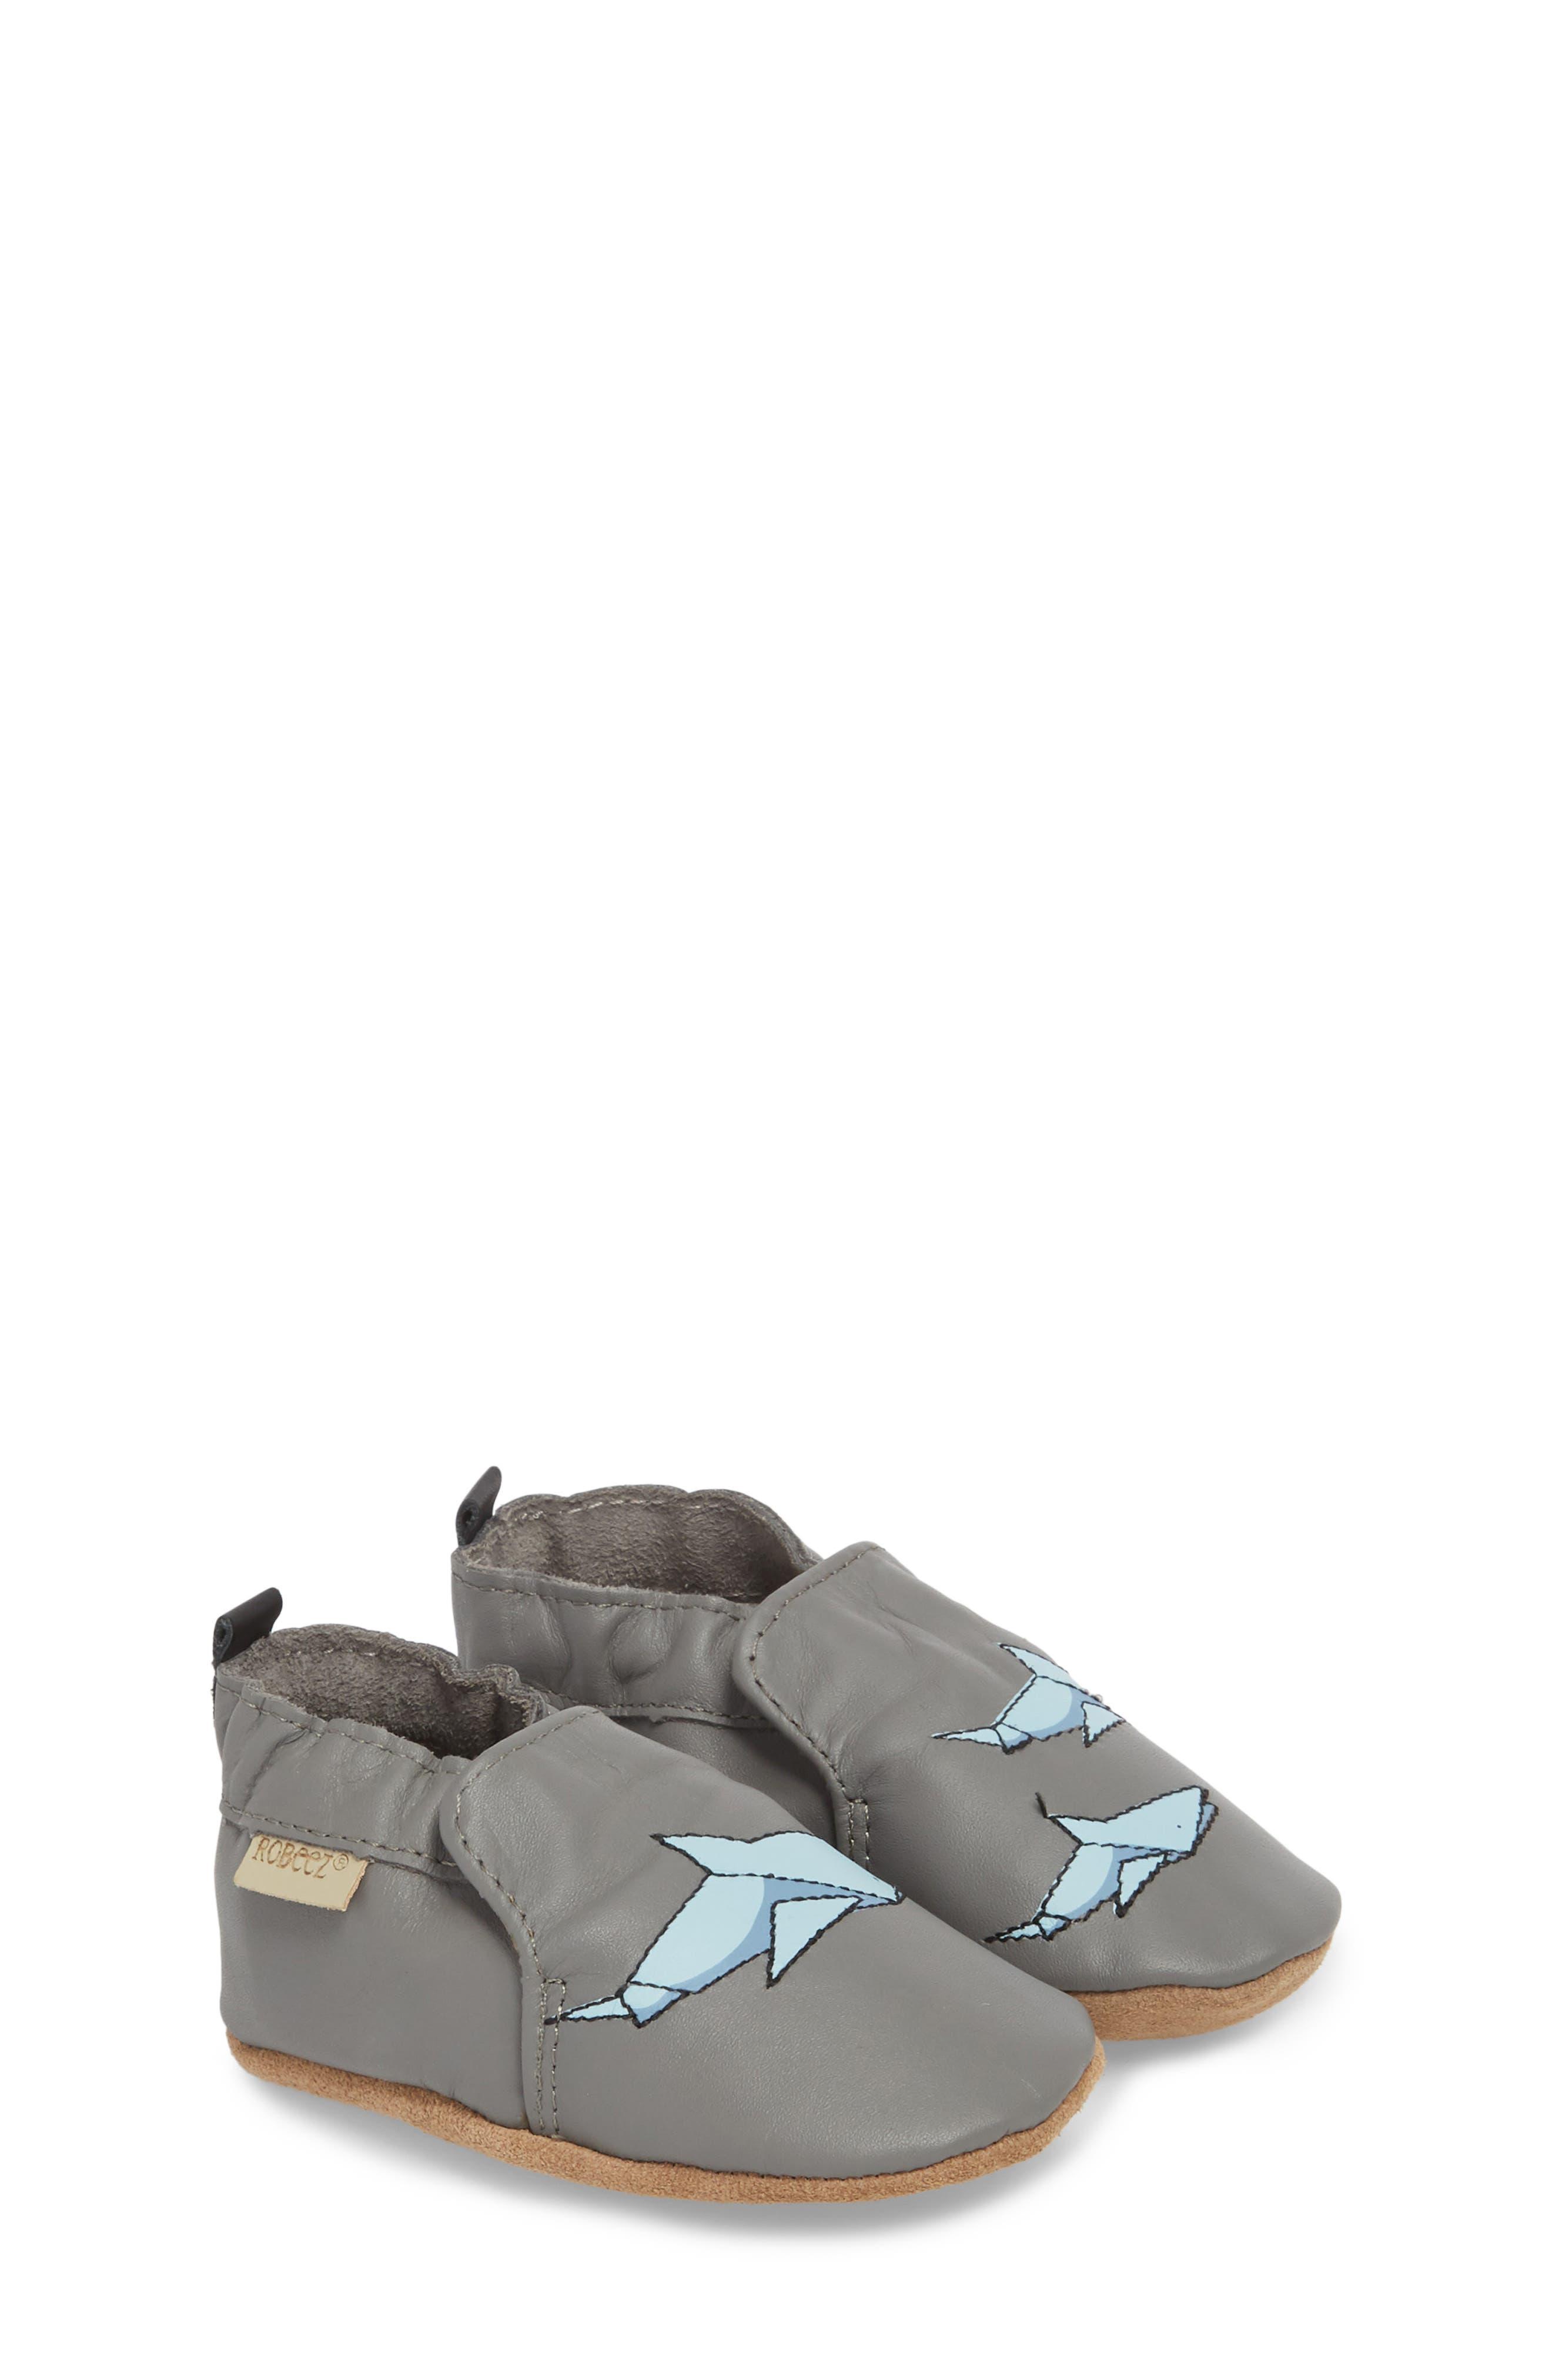 Sharktastic Moccasin Crib Shoe,                             Alternate thumbnail 3, color,                             Grey